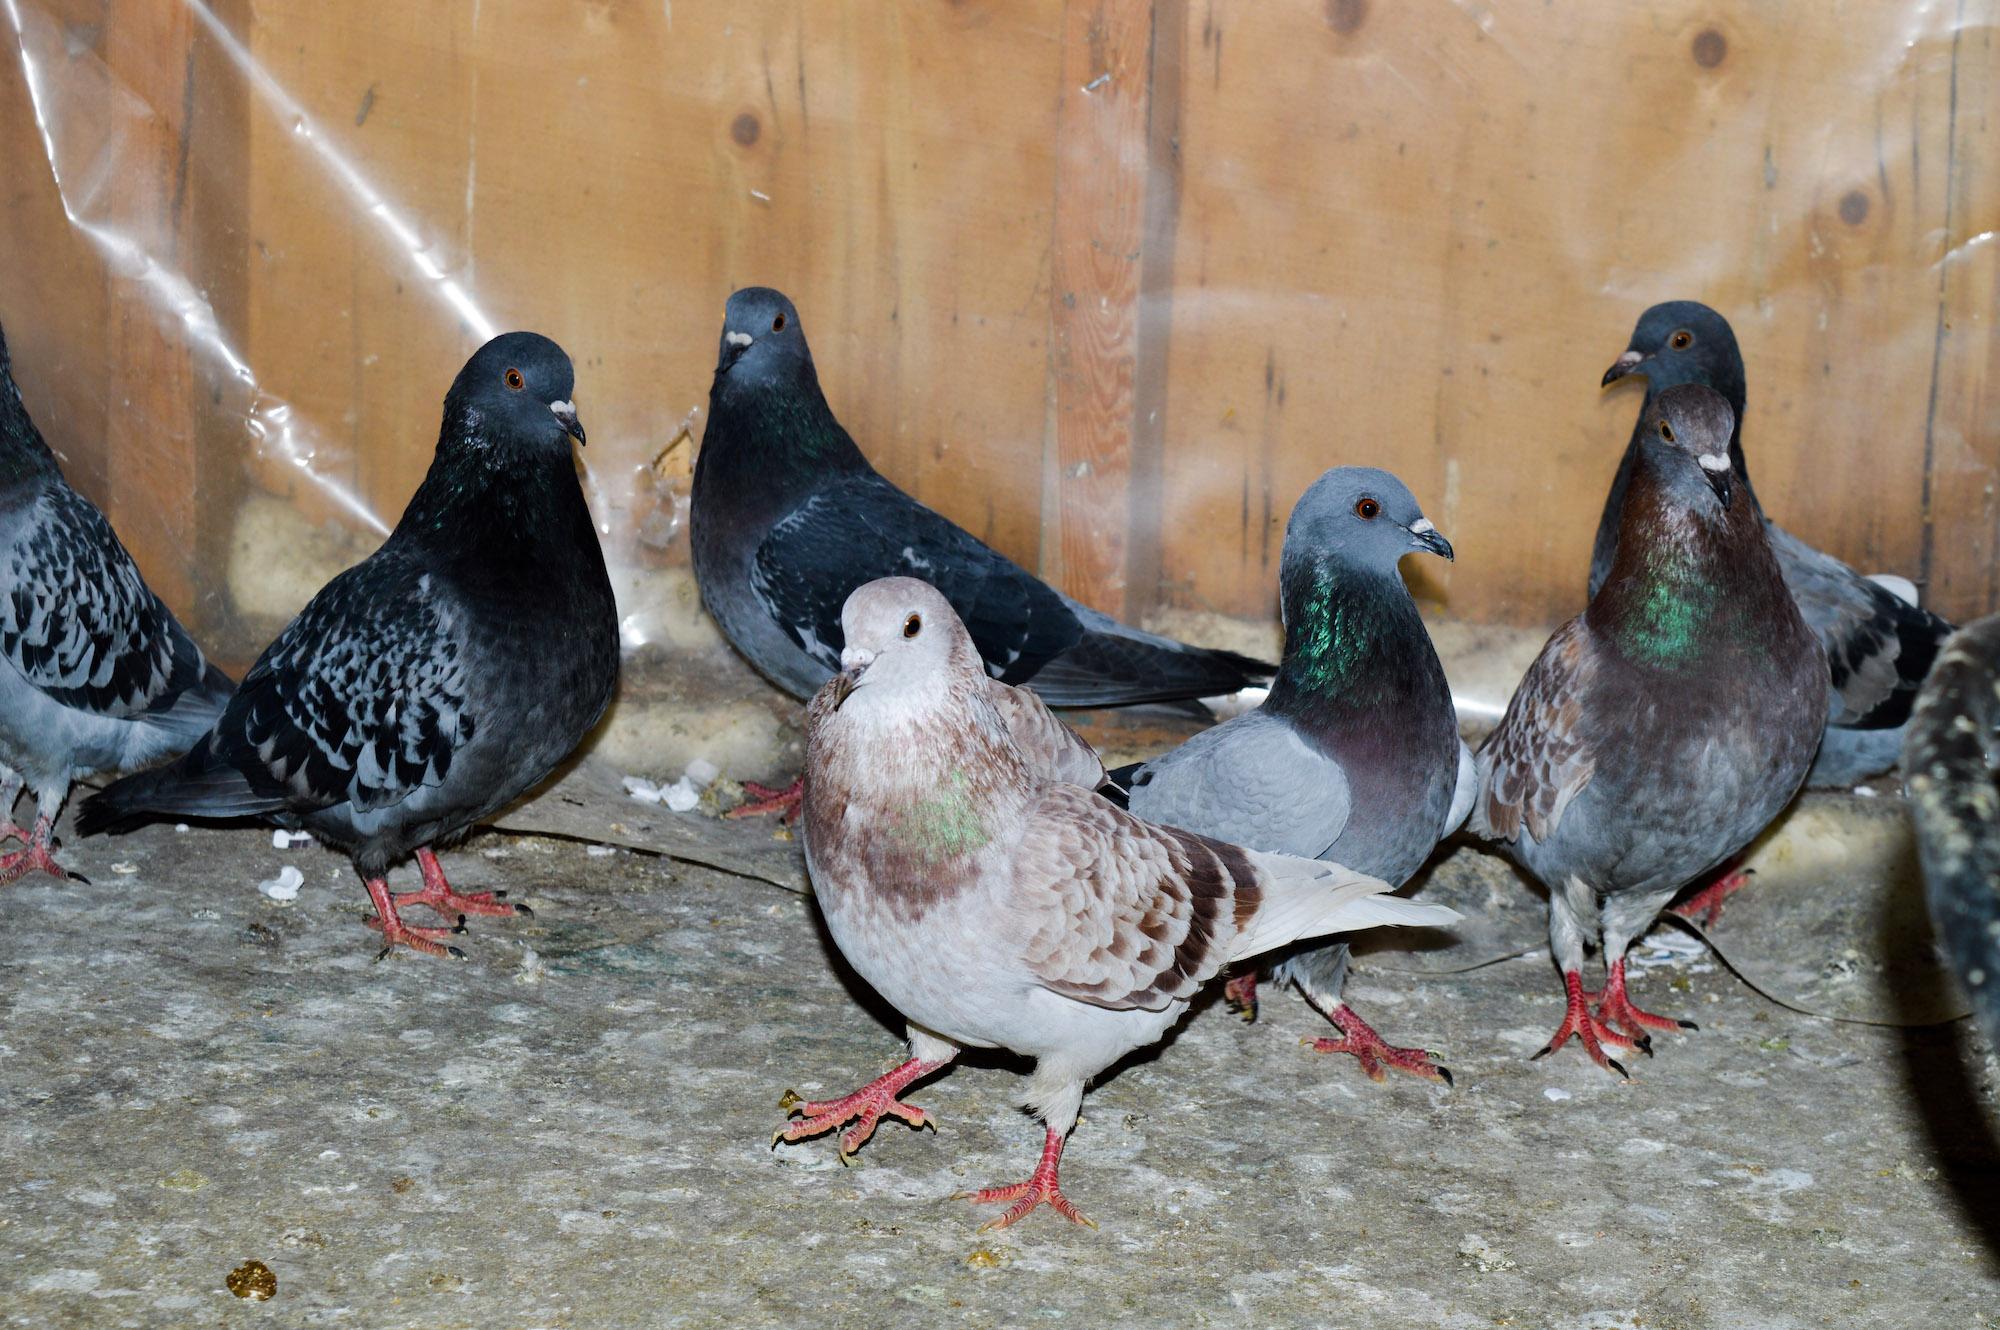 Pigeons in Fagan's backyard.